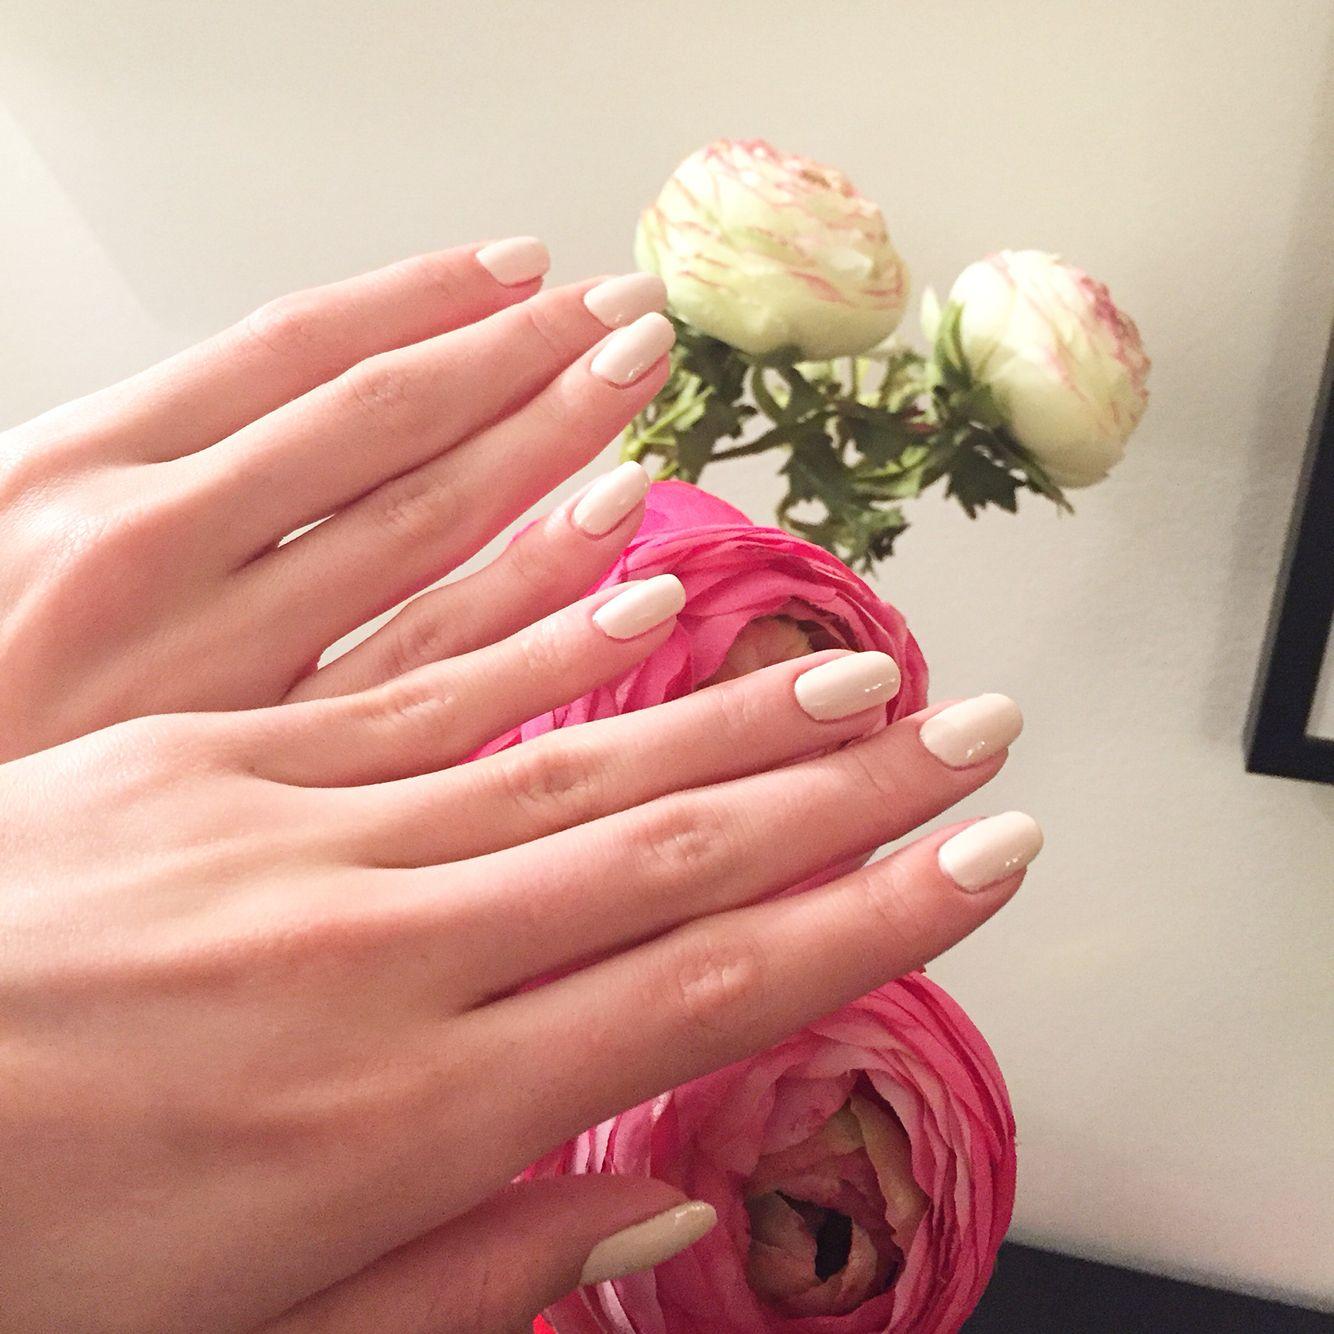 Pretty nails #flowers #opi #newcollection #ss16 #shopping #harrods #harveynichols #mayfair #mountstreet #mountstreetdeli #nailsathome #manitime #booknow